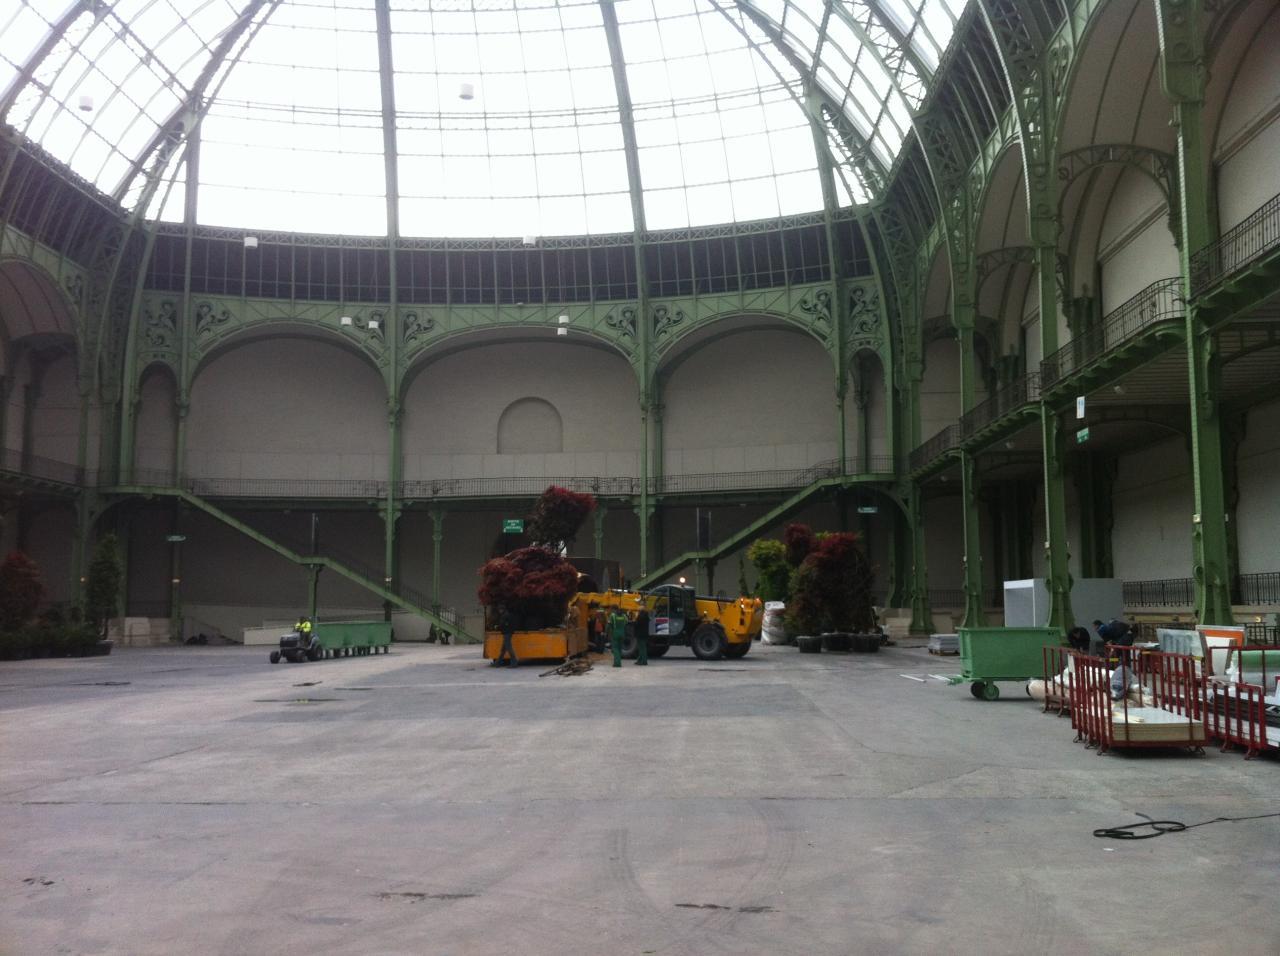 Galerie photo for Art du jardin grand palais